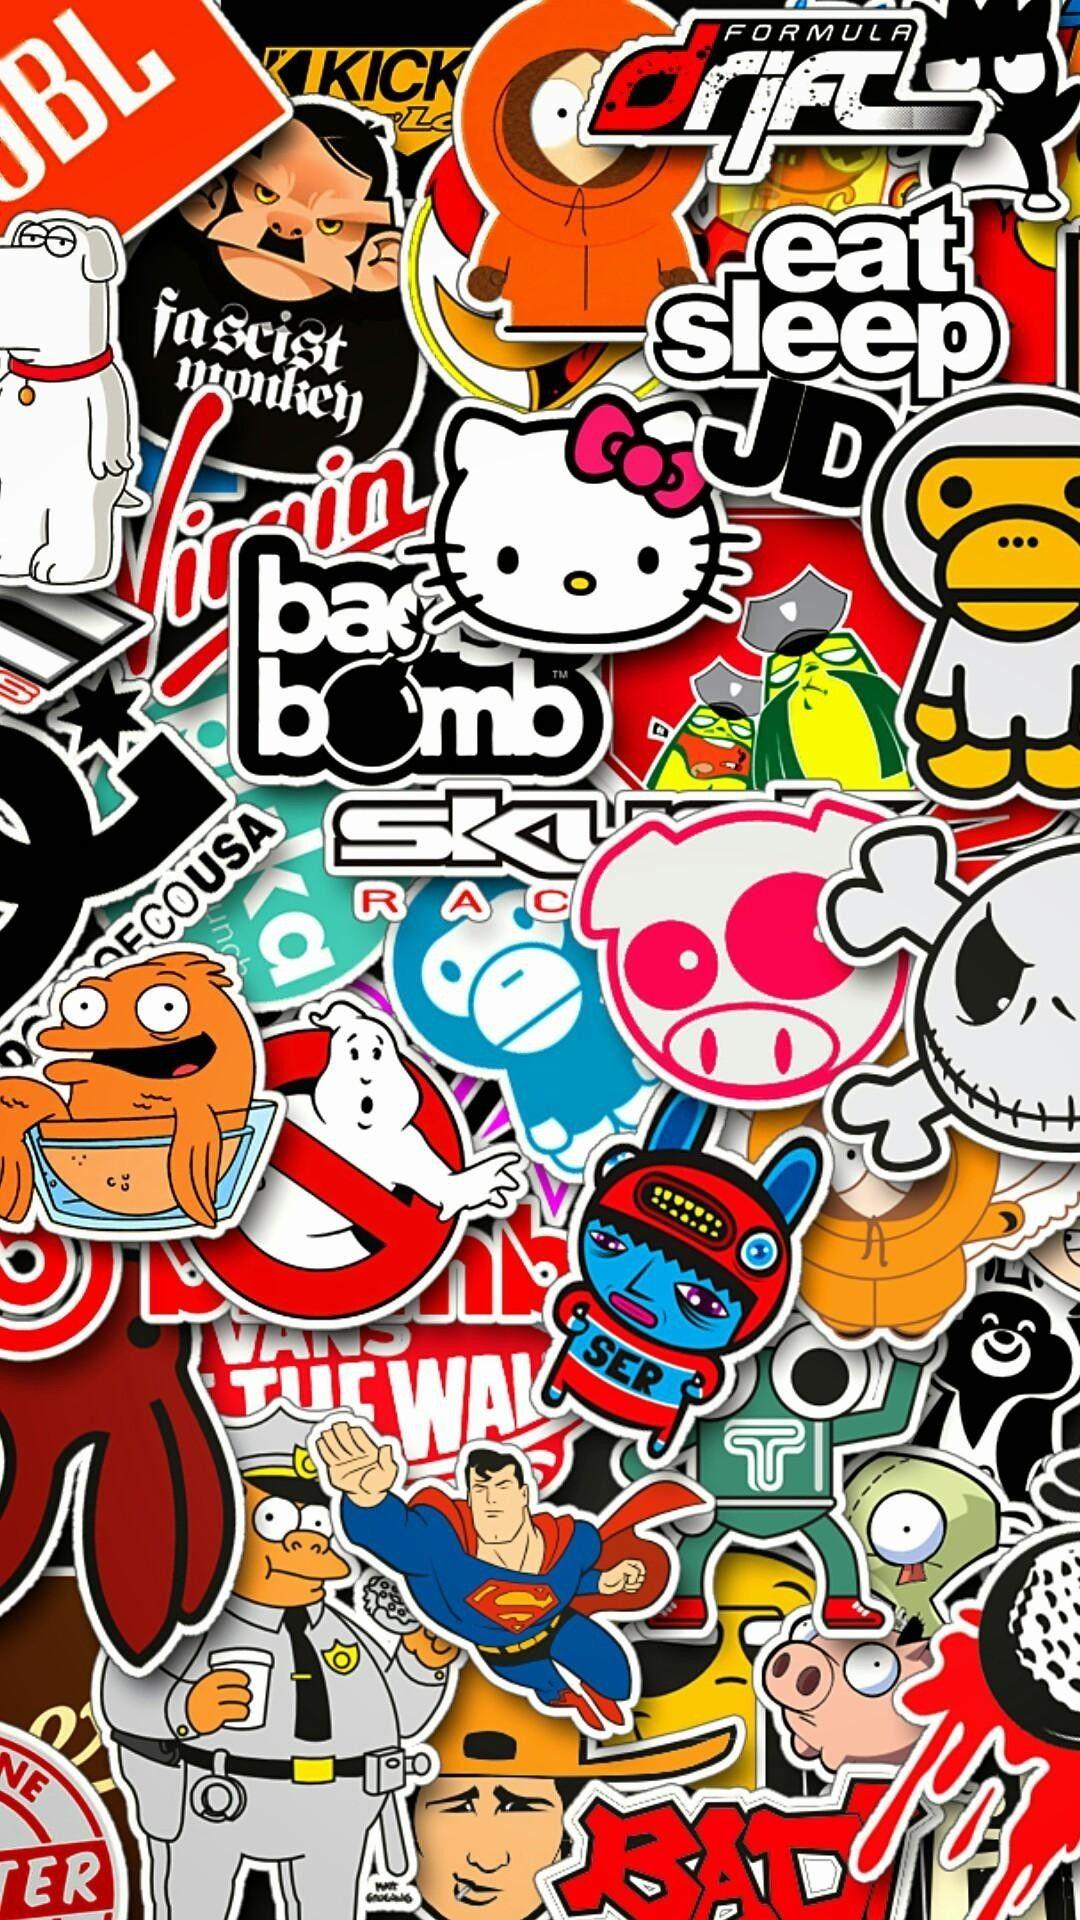 1080x1920 1080 X 1920 Background Vertical Download Free Sticker Bomb Wallpaper Sticker Bomb Graffiti Wallpaper